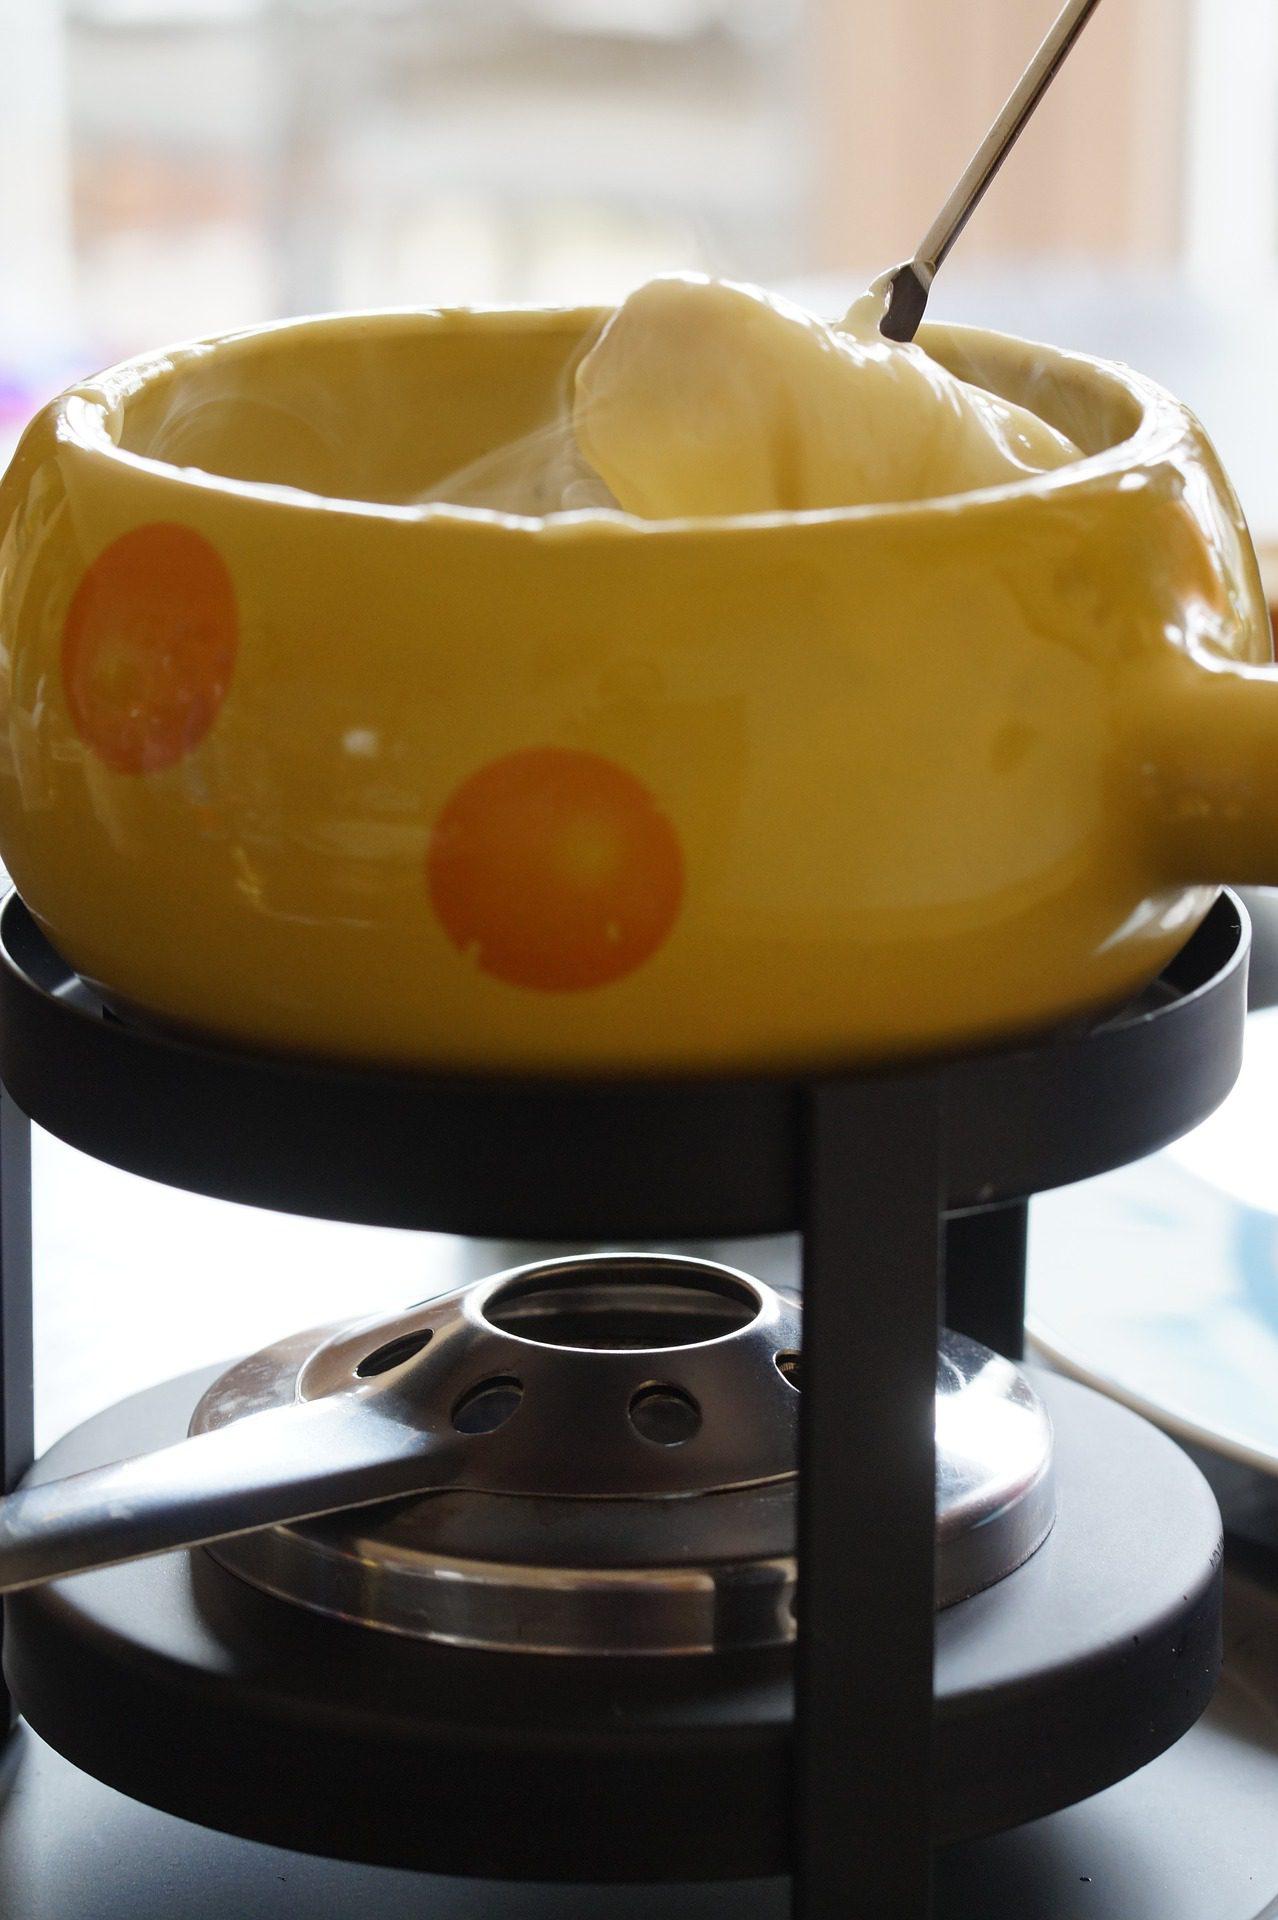 Swiss Cheese Fondue in a Pot